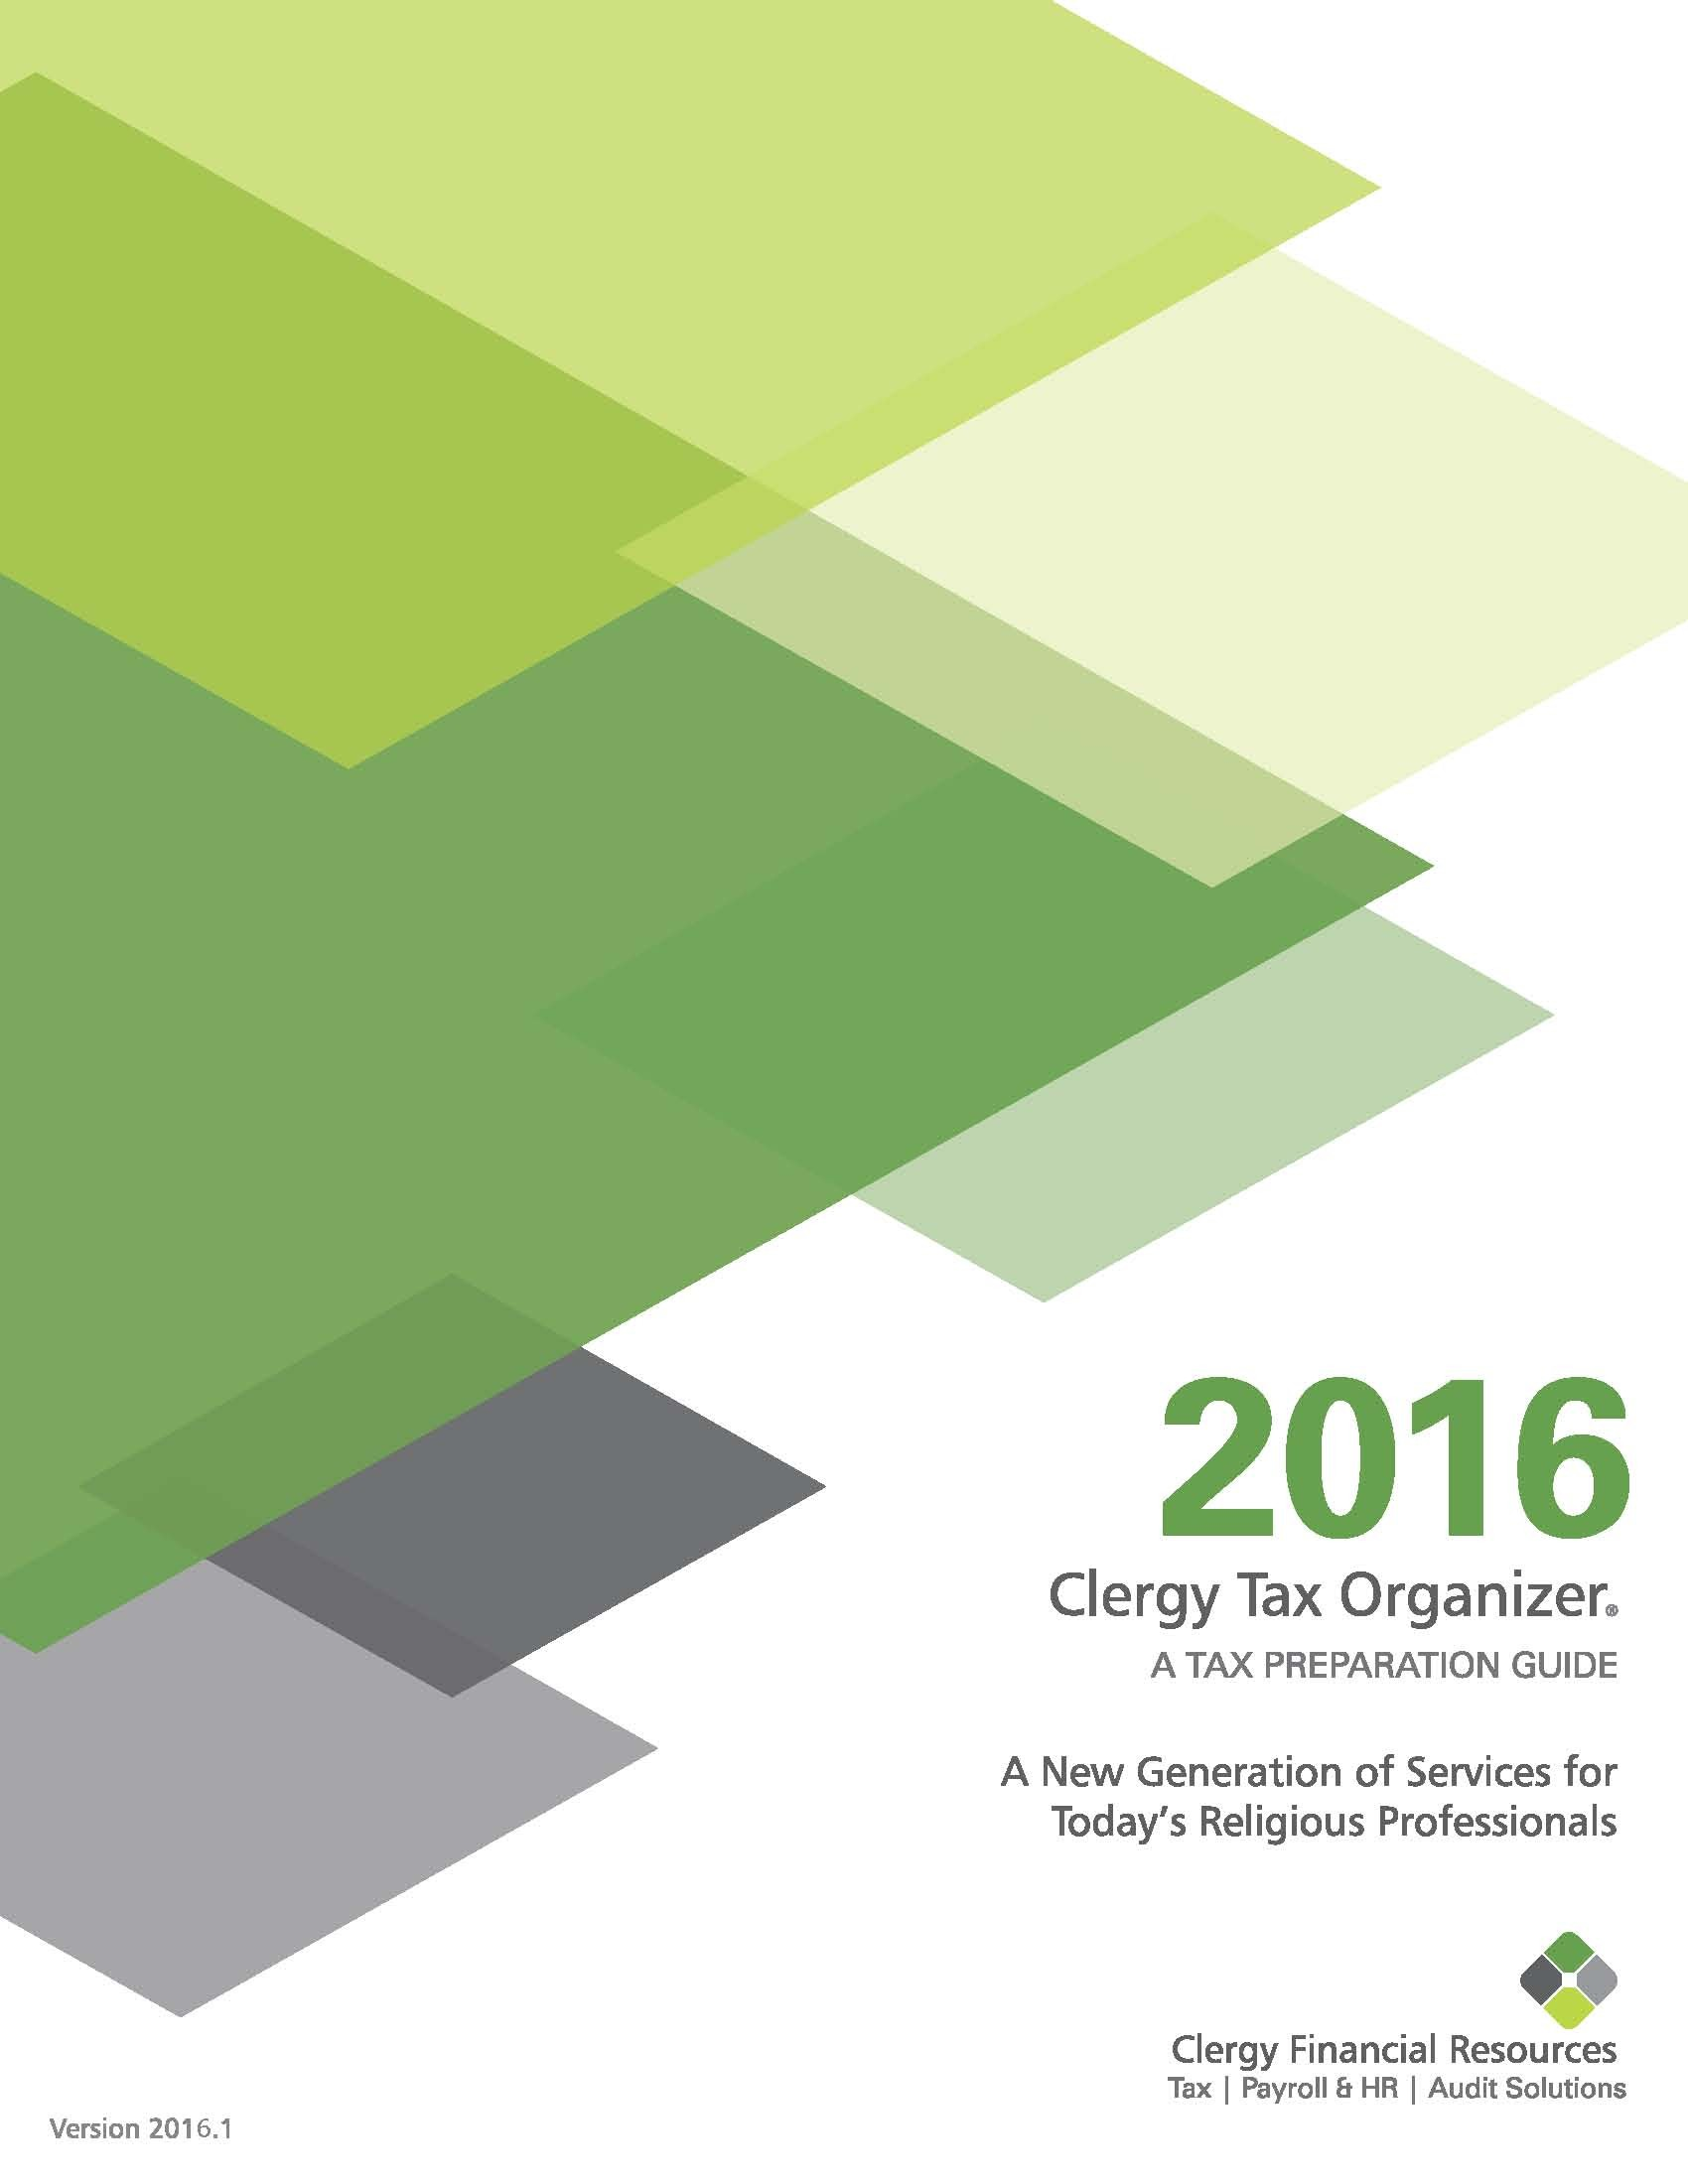 2016 Clergy Tax Organizer - PDF Download